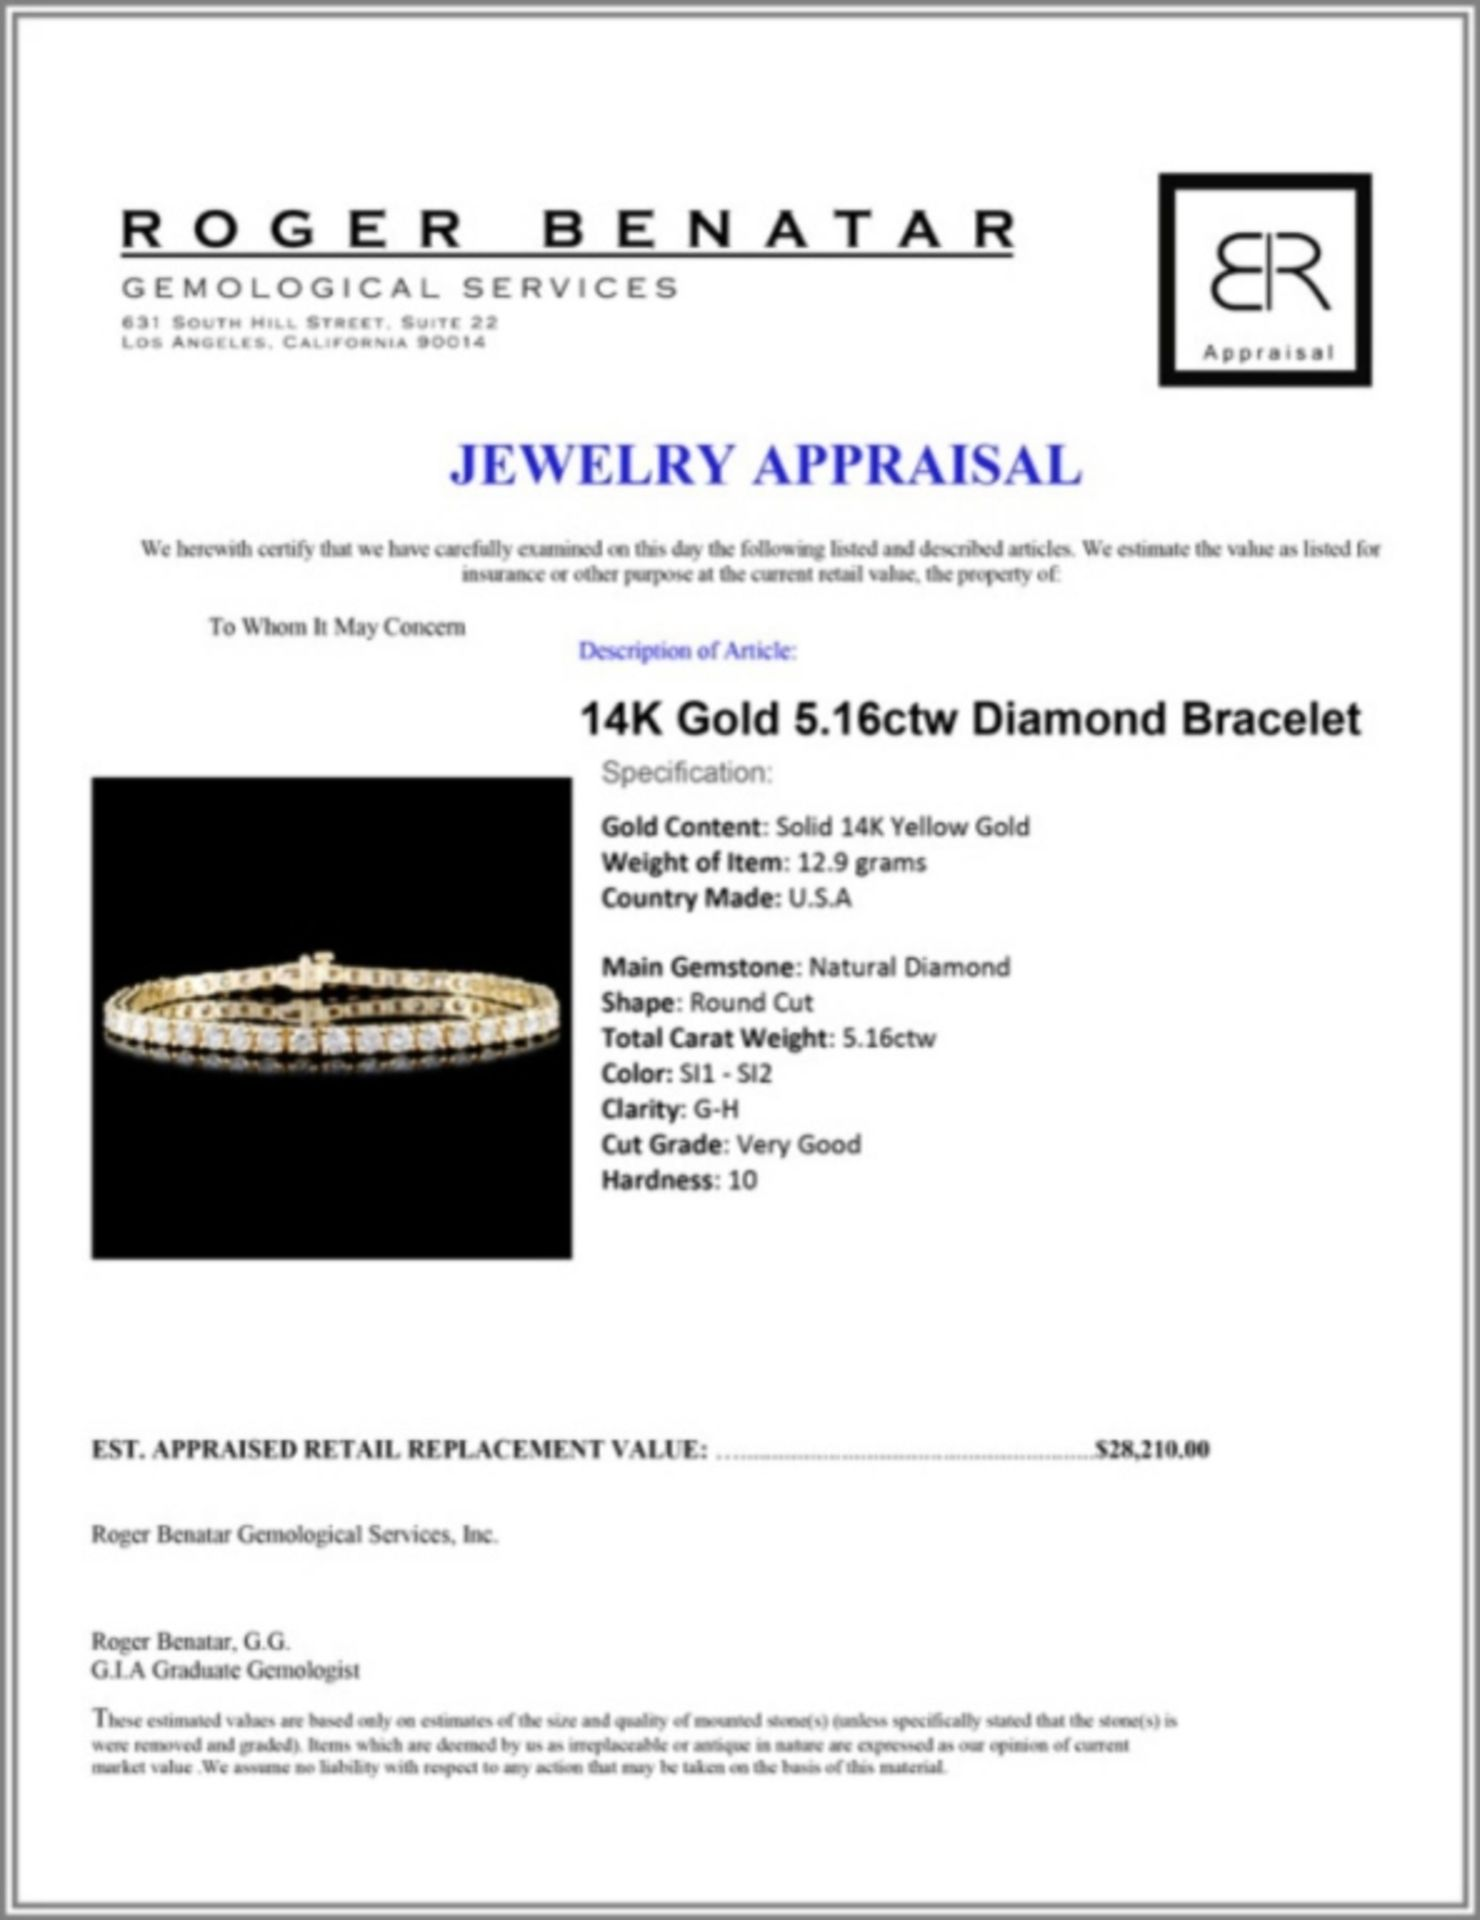 14K Gold 5.16ctw Diamond Bracelet - Image 3 of 3